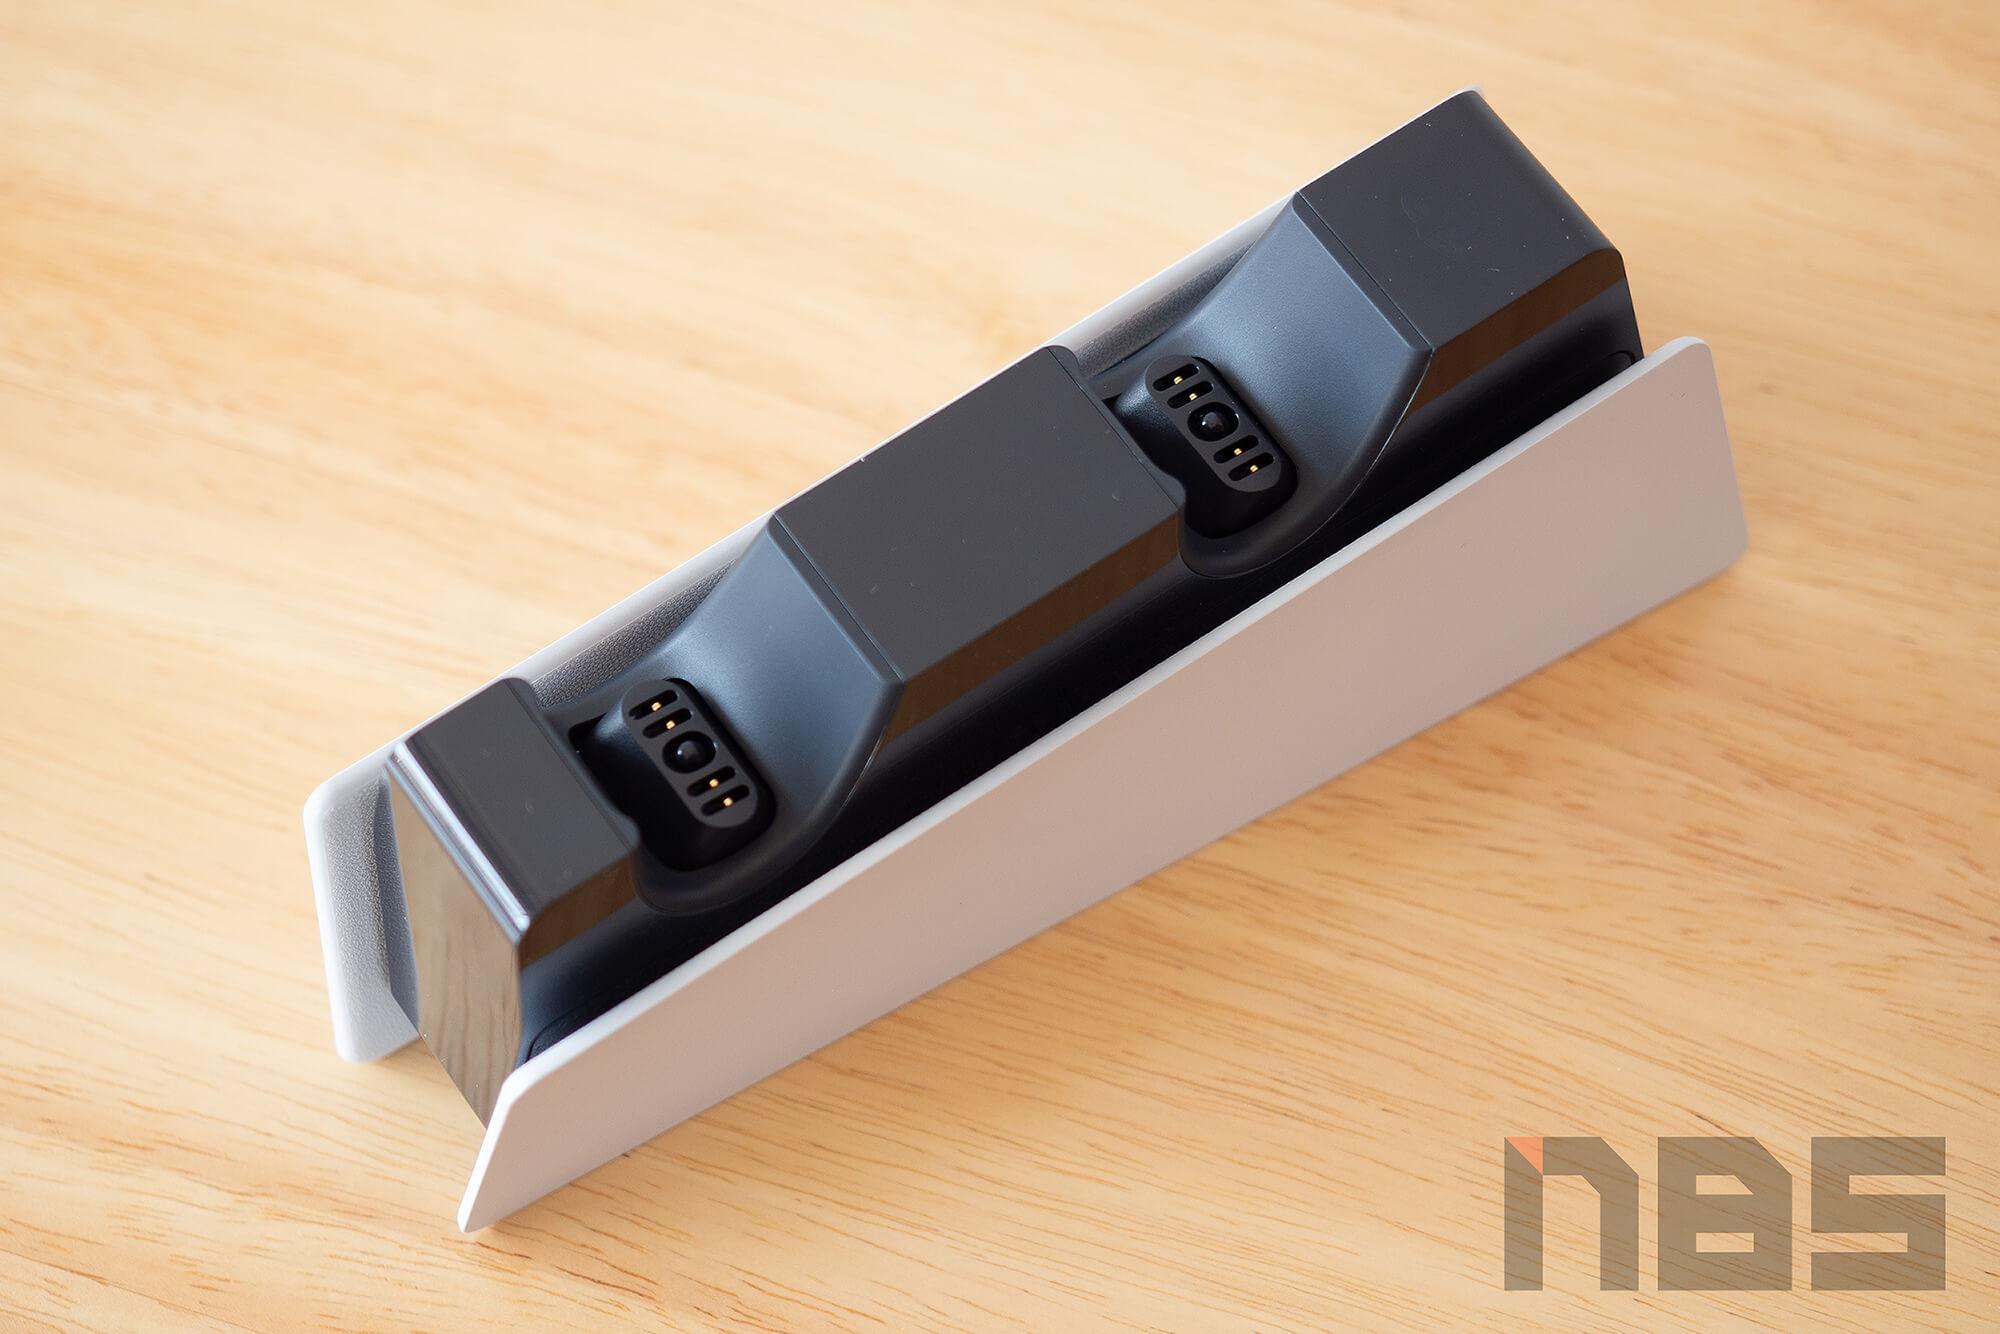 Review PlayStation 5 DualSense Charging Station NotebookSPEC 08